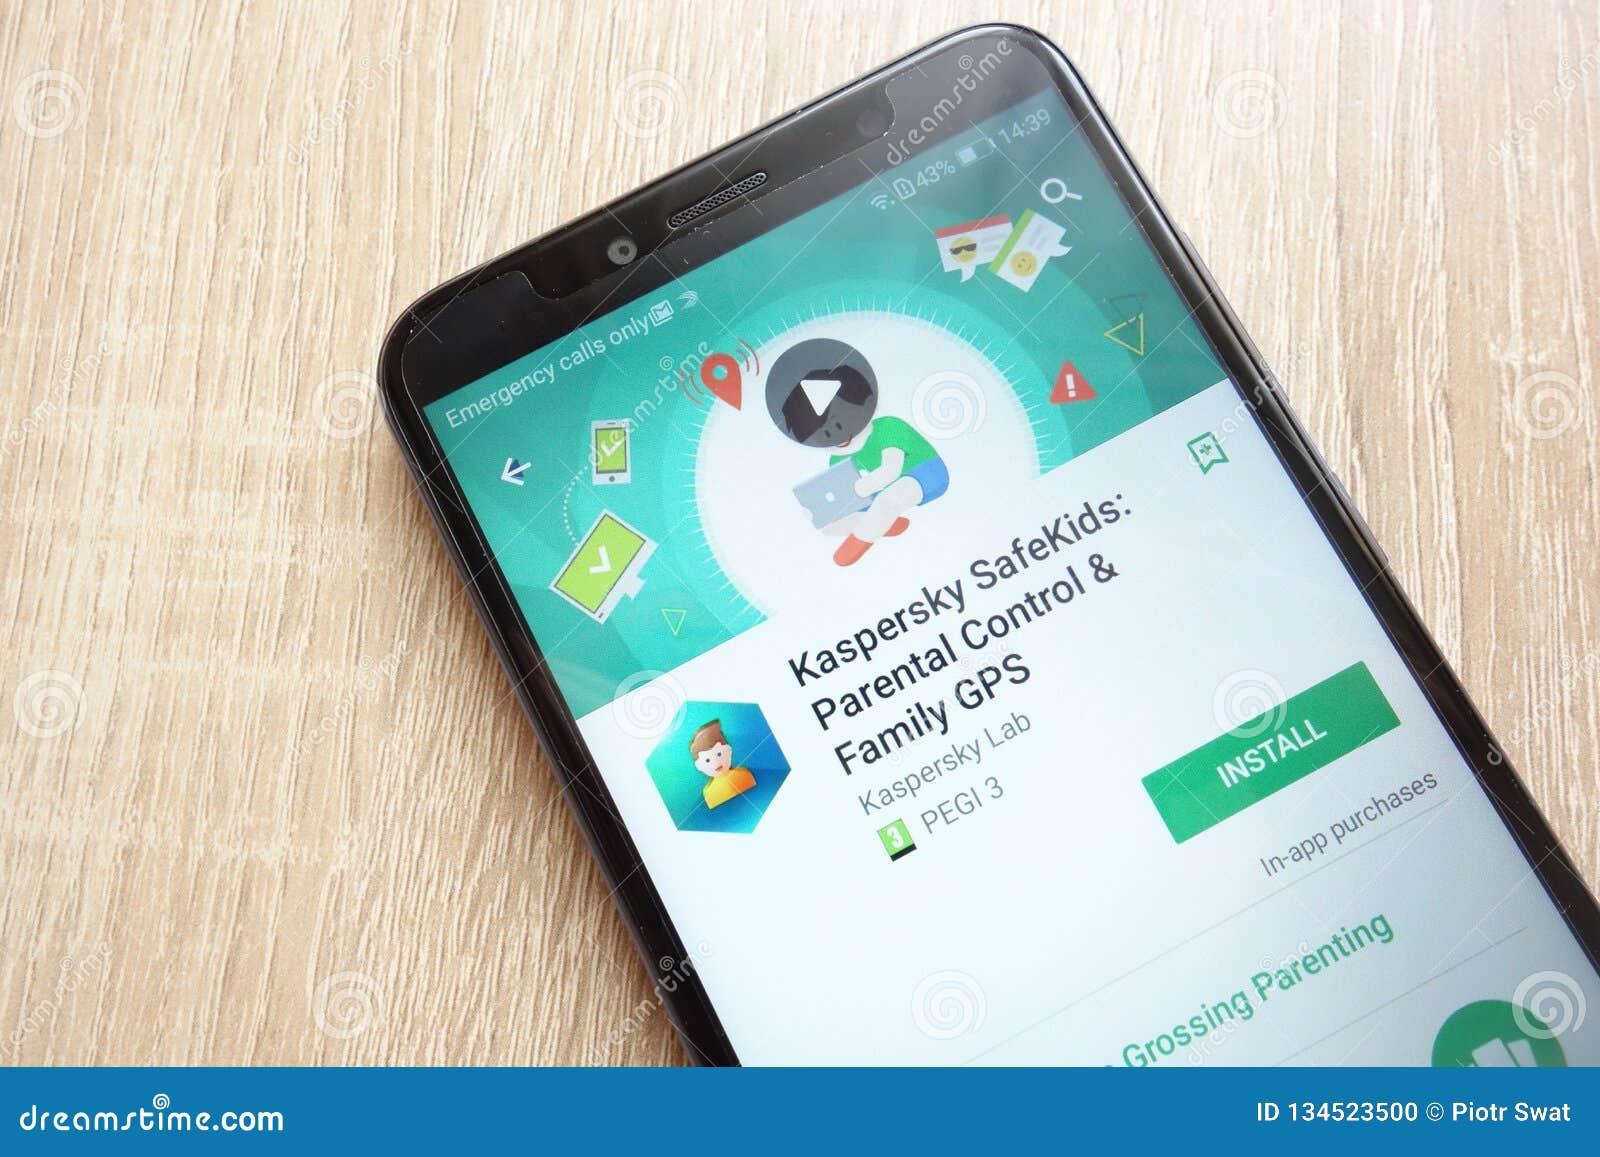 Kaspersky Safe Kids: Parental Control And Family GPS App On